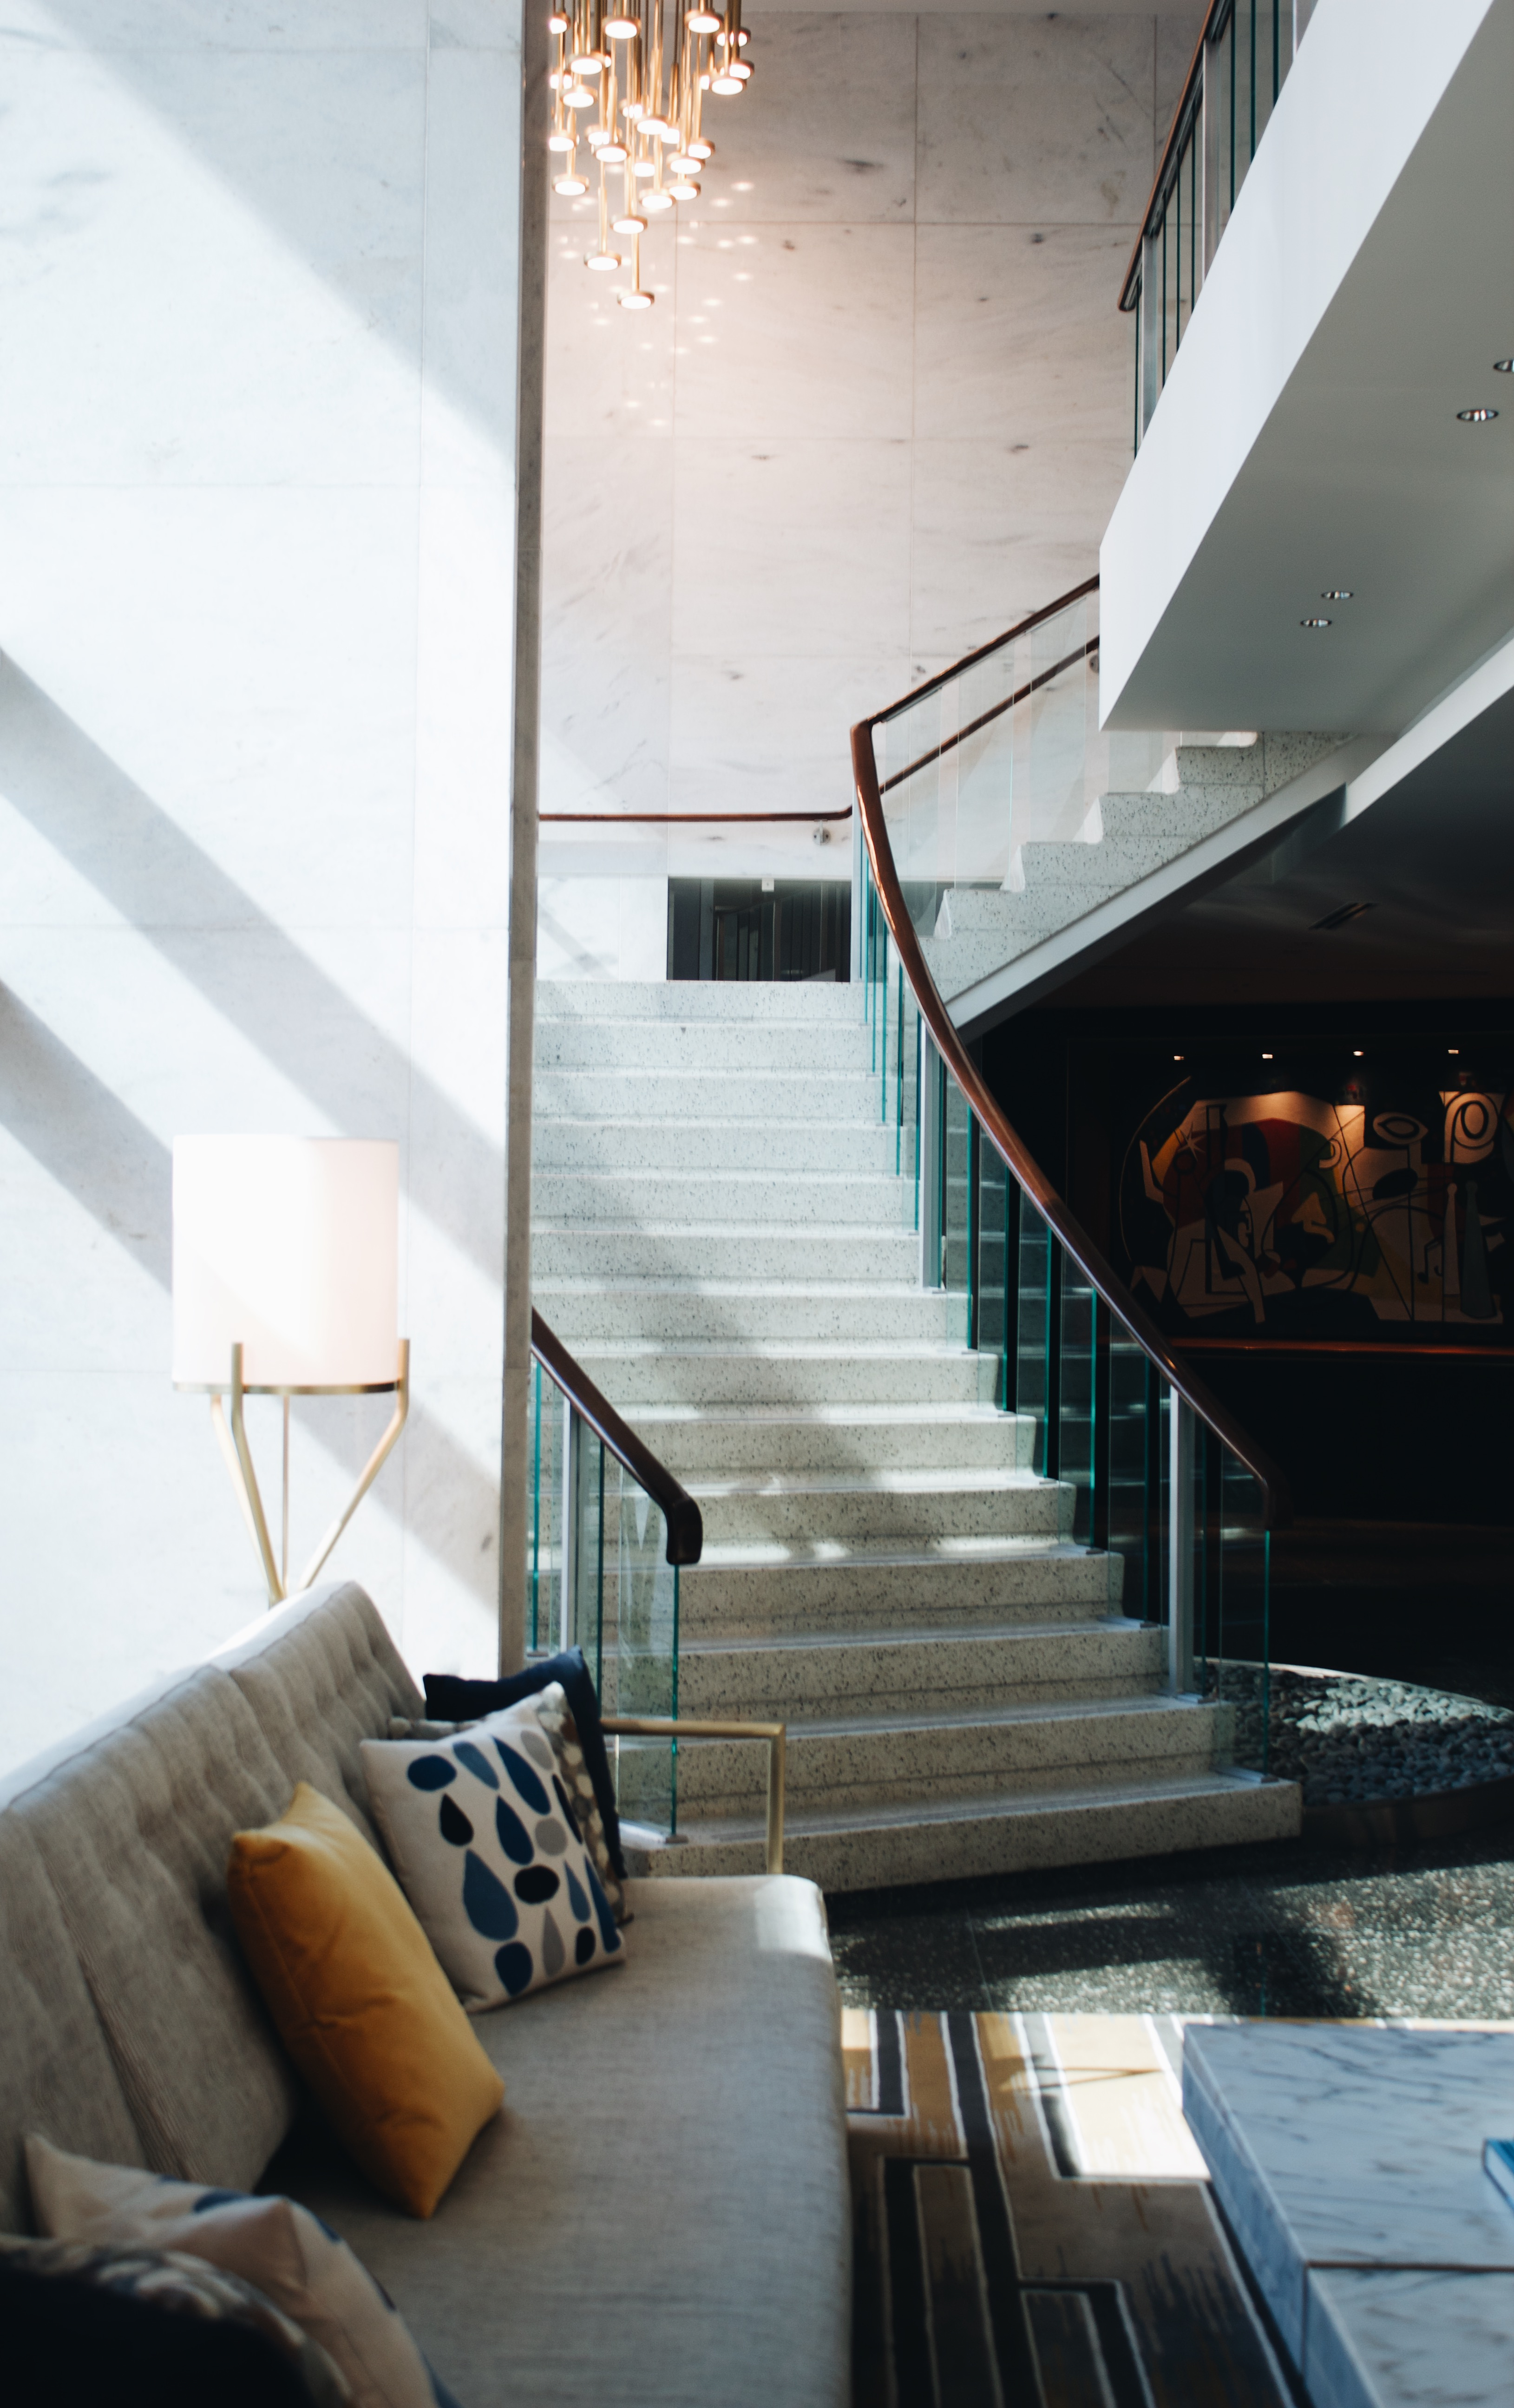 Interior Design Pictures Download Free Images on Unsplash